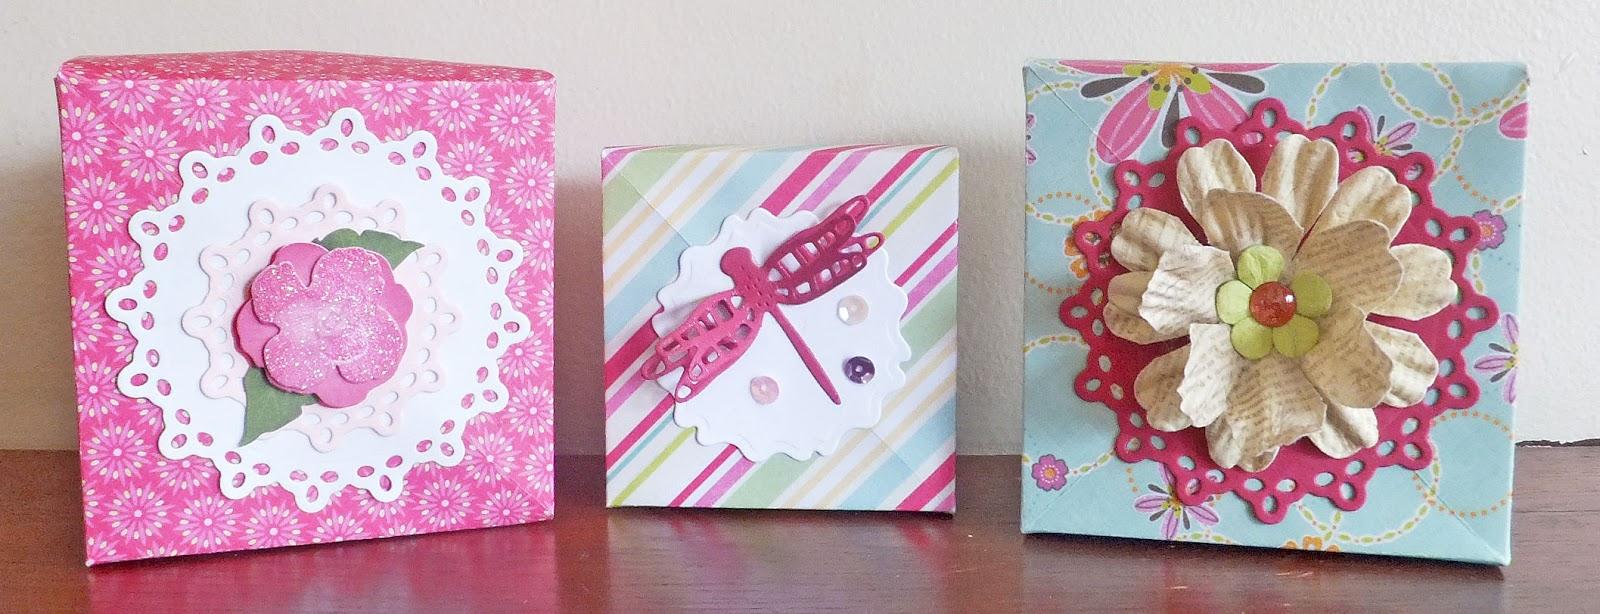 Super Simple Origami: 32 New Designs (Dover Origami Papercraft ...   614x1600